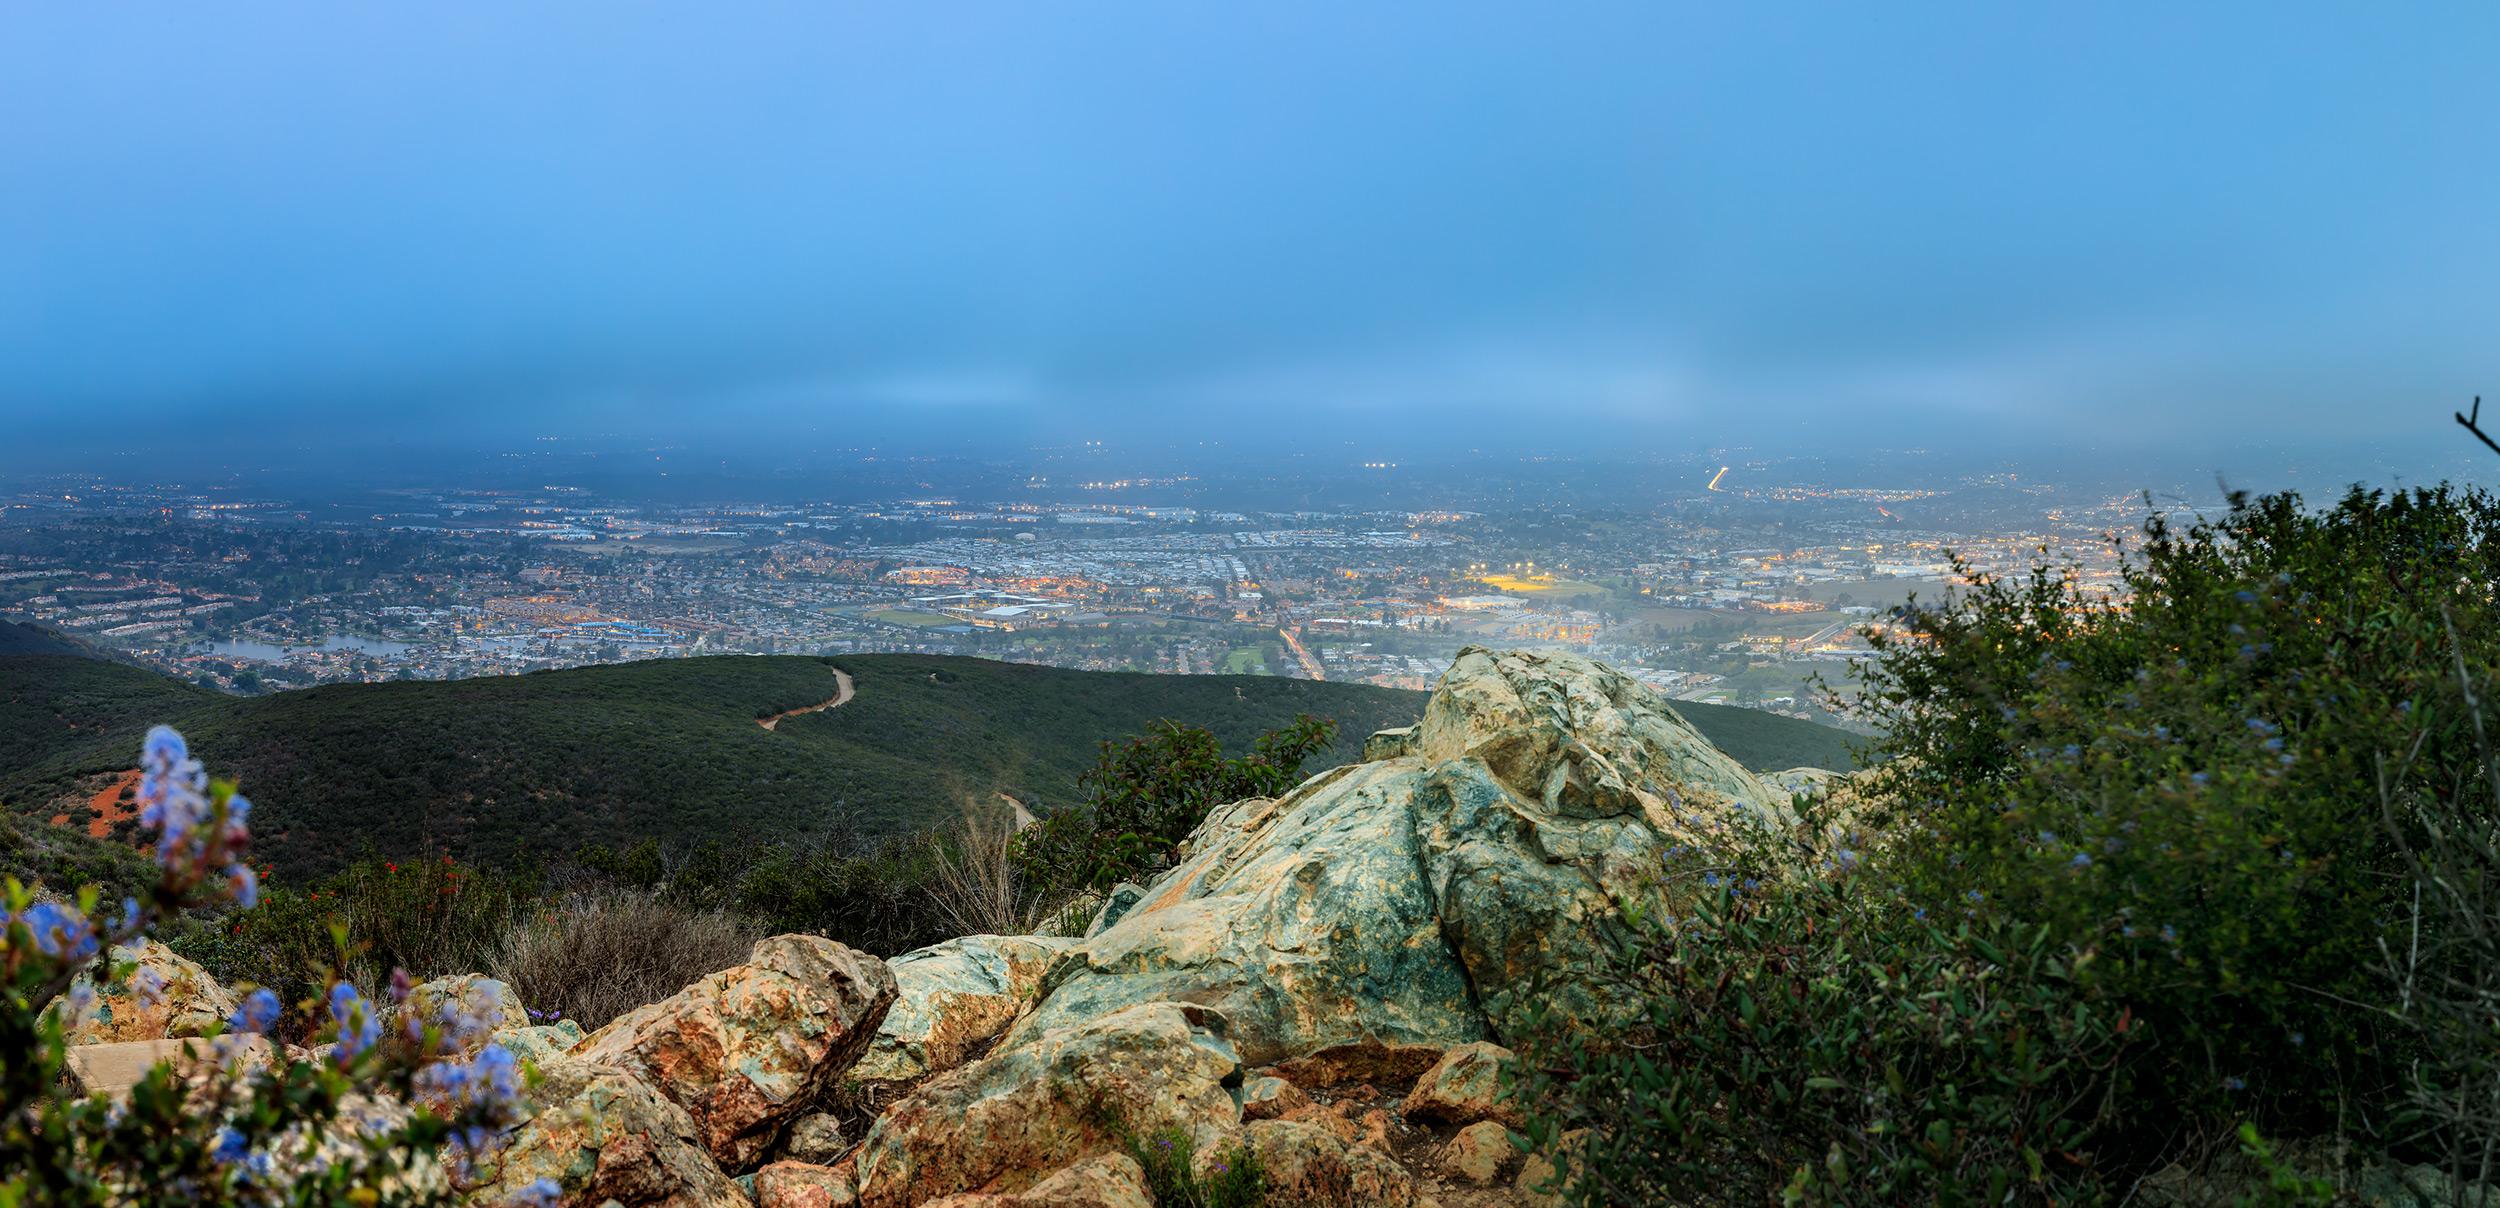 San-Diego-2018-1229-Pano.jpg